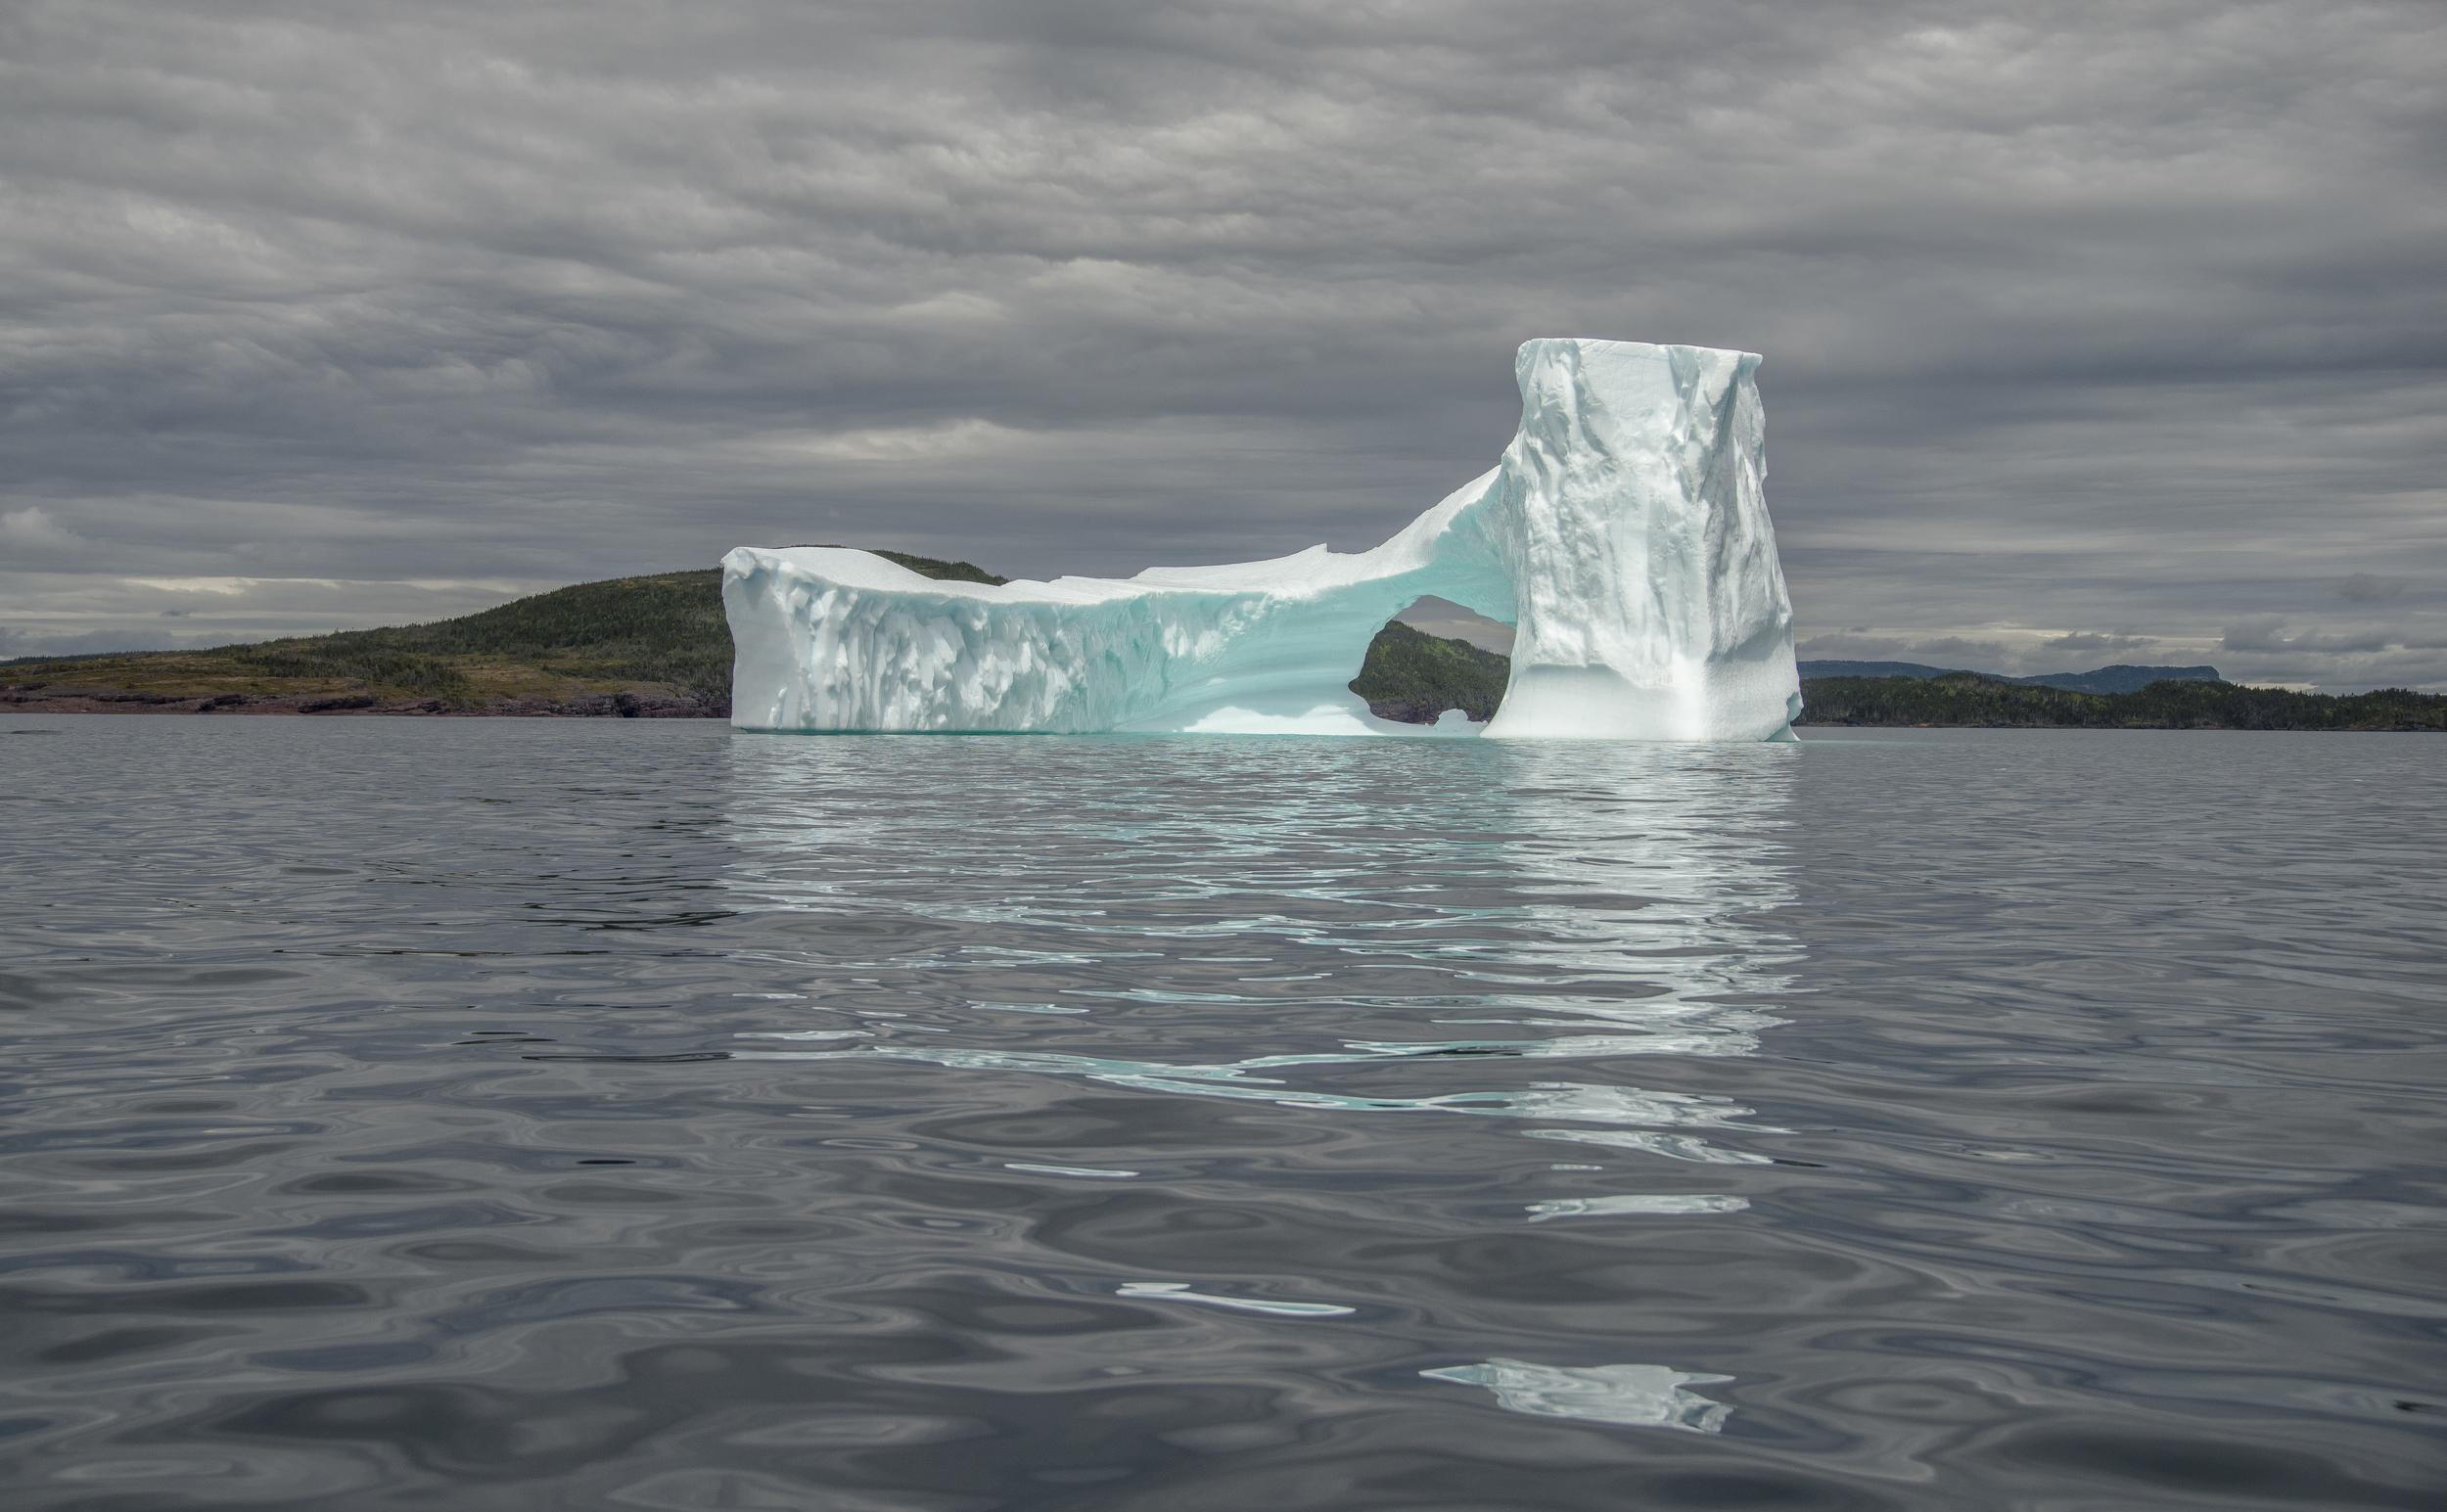 Newfoundland+Iceberg+2015.jpg